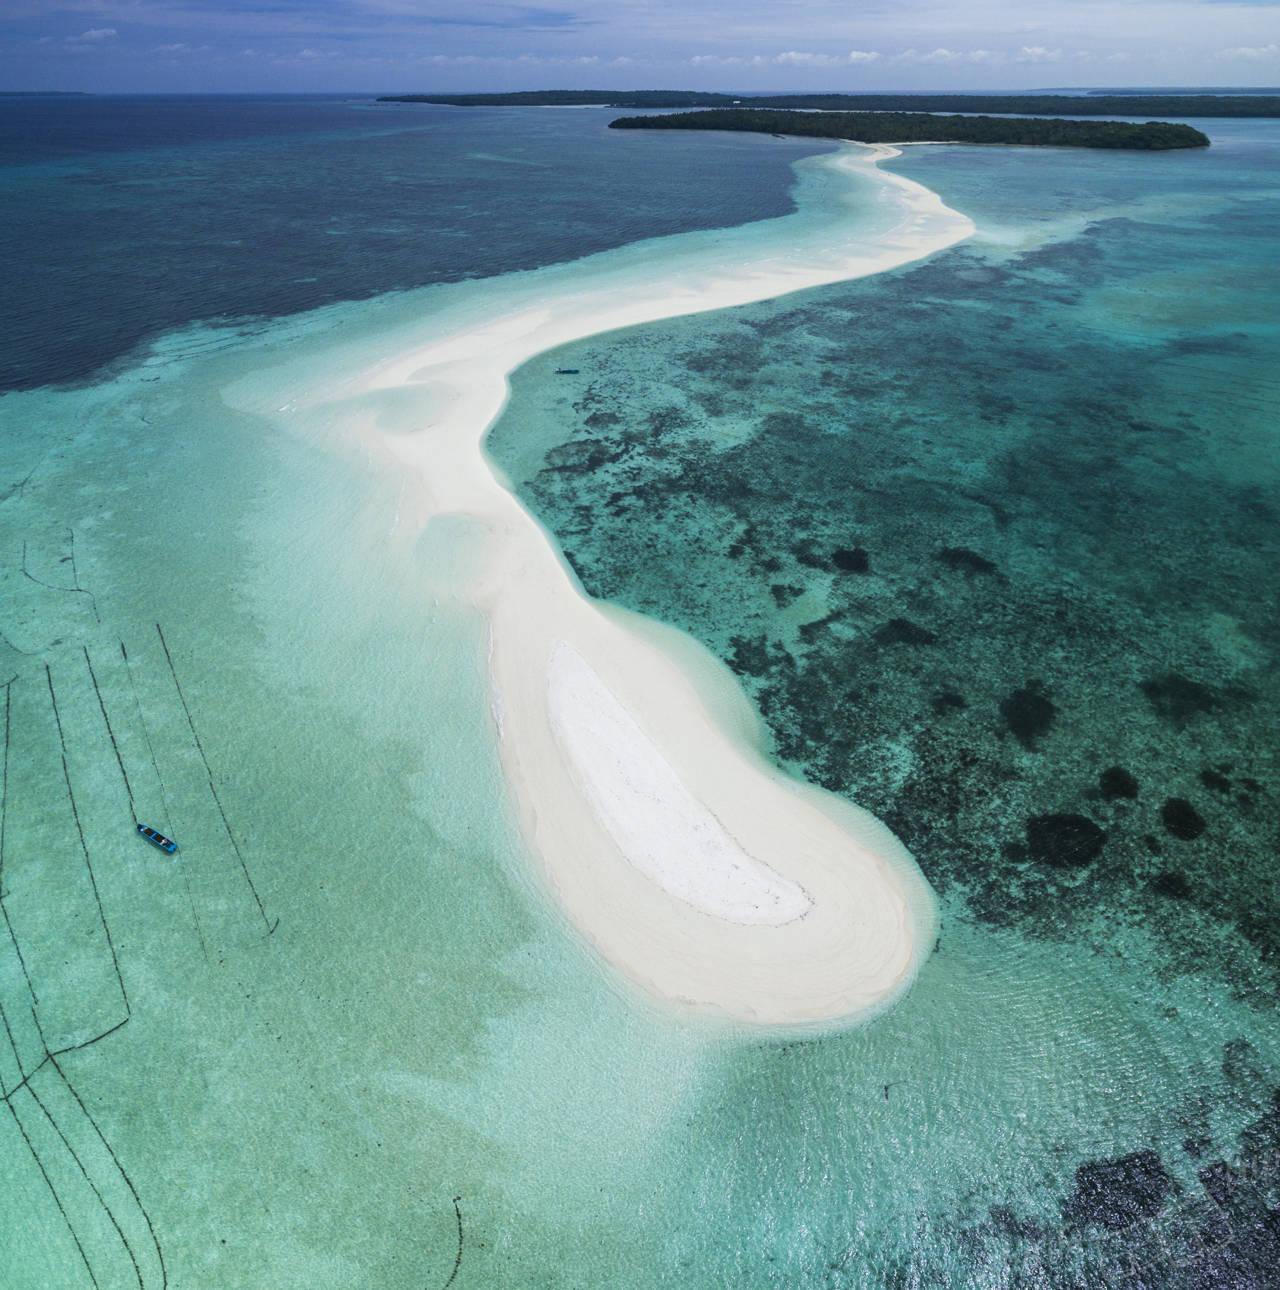 ngurtafur, ngurtafur kei, kei islands, ngurtafur drone, ngurtafur aerial, ngurtafur info, ngurtafur sand bar, ngurtafur how to get there